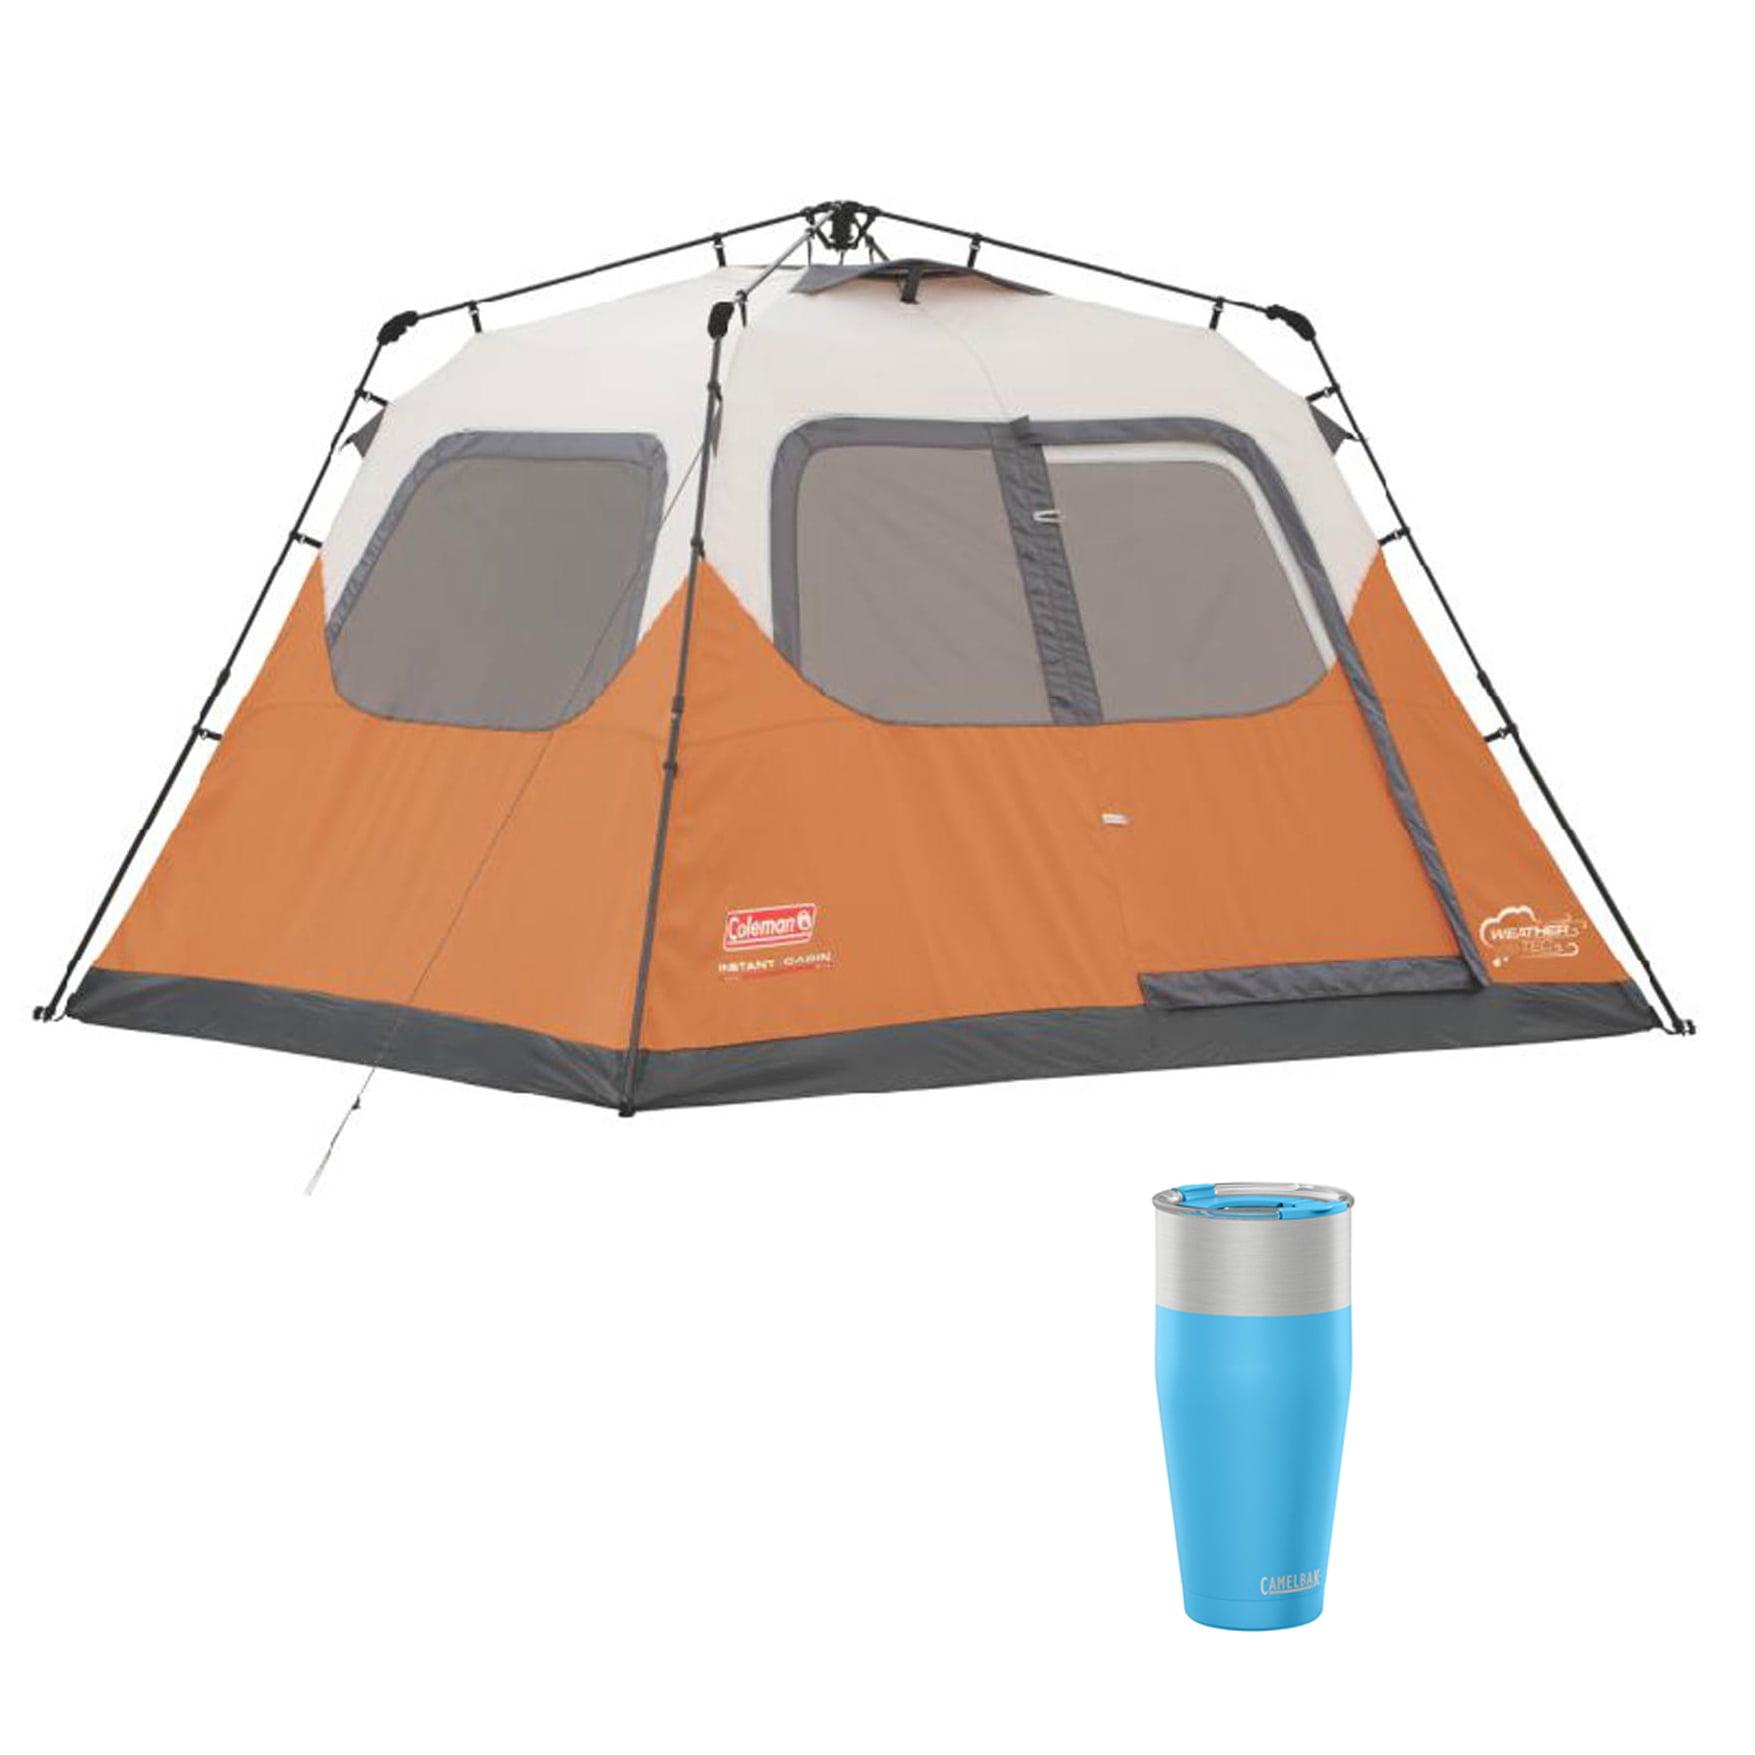 Coleman Outdoor 6 Person Instant Family Camping Tent & CamelBak 30 Oz Tumbler